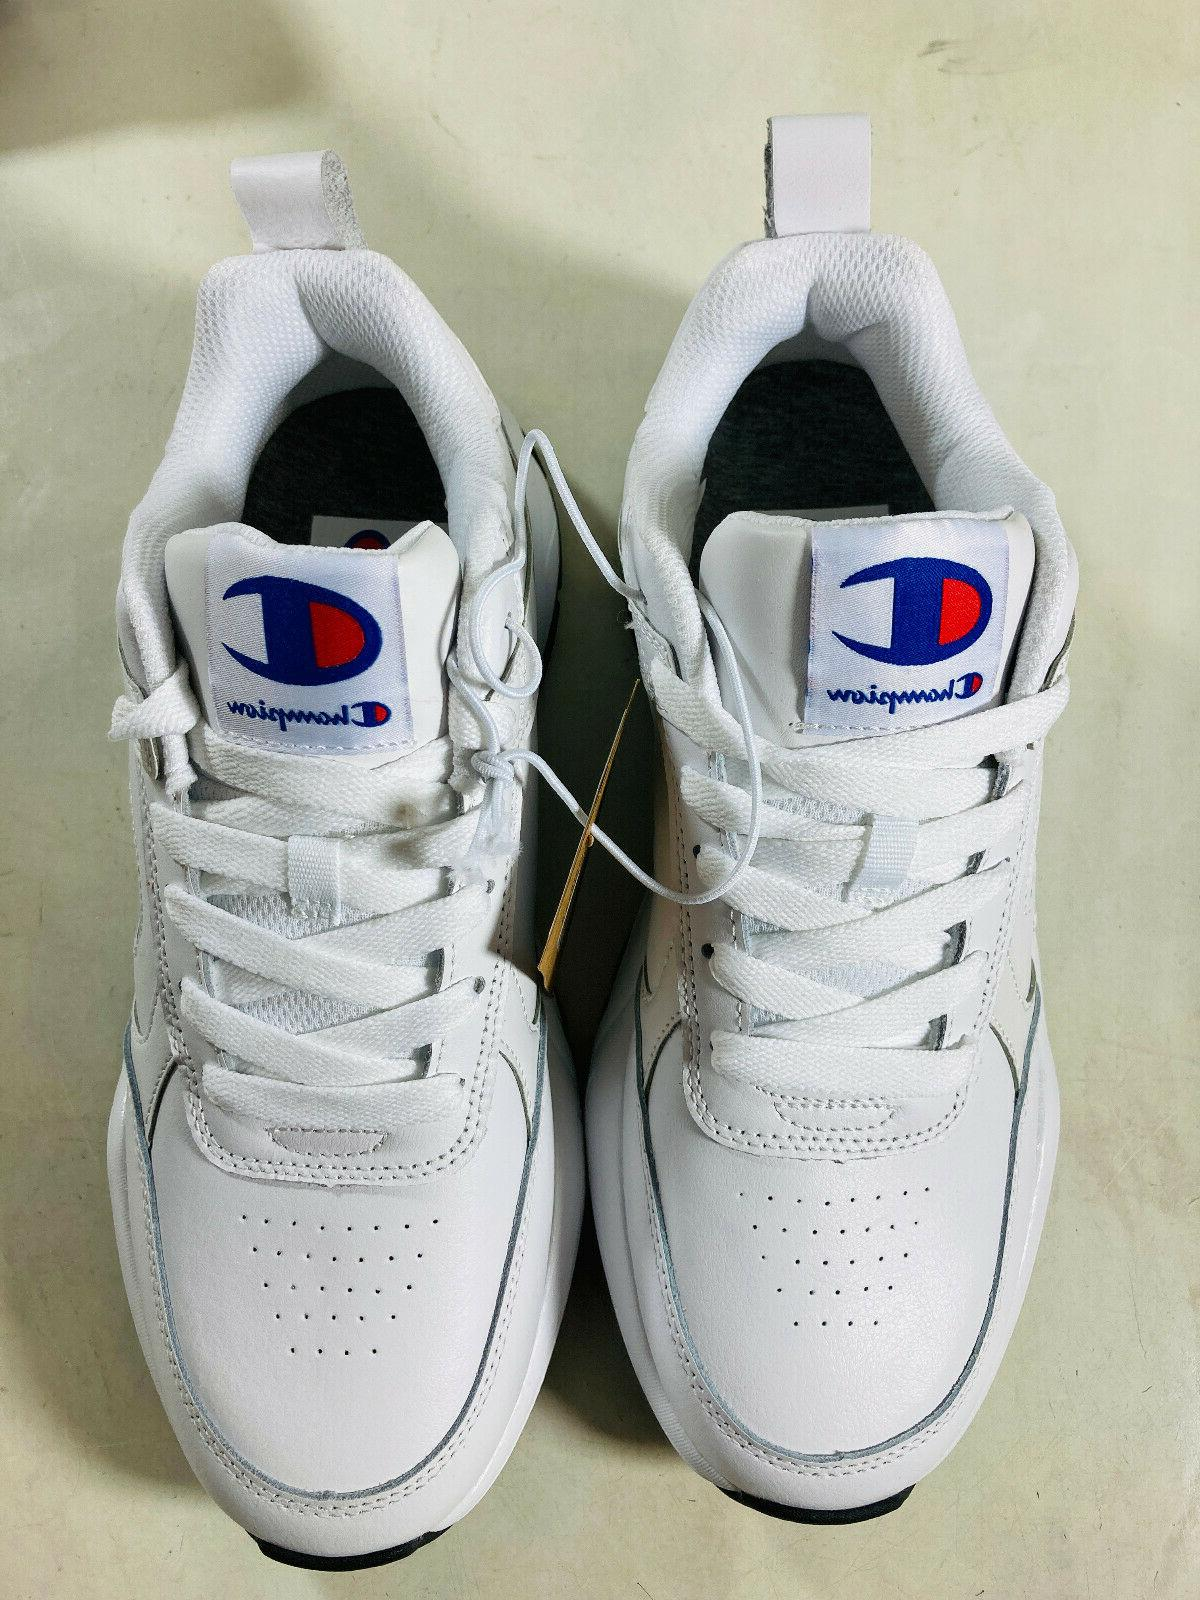 new men s 93eighteen casual leather tennis